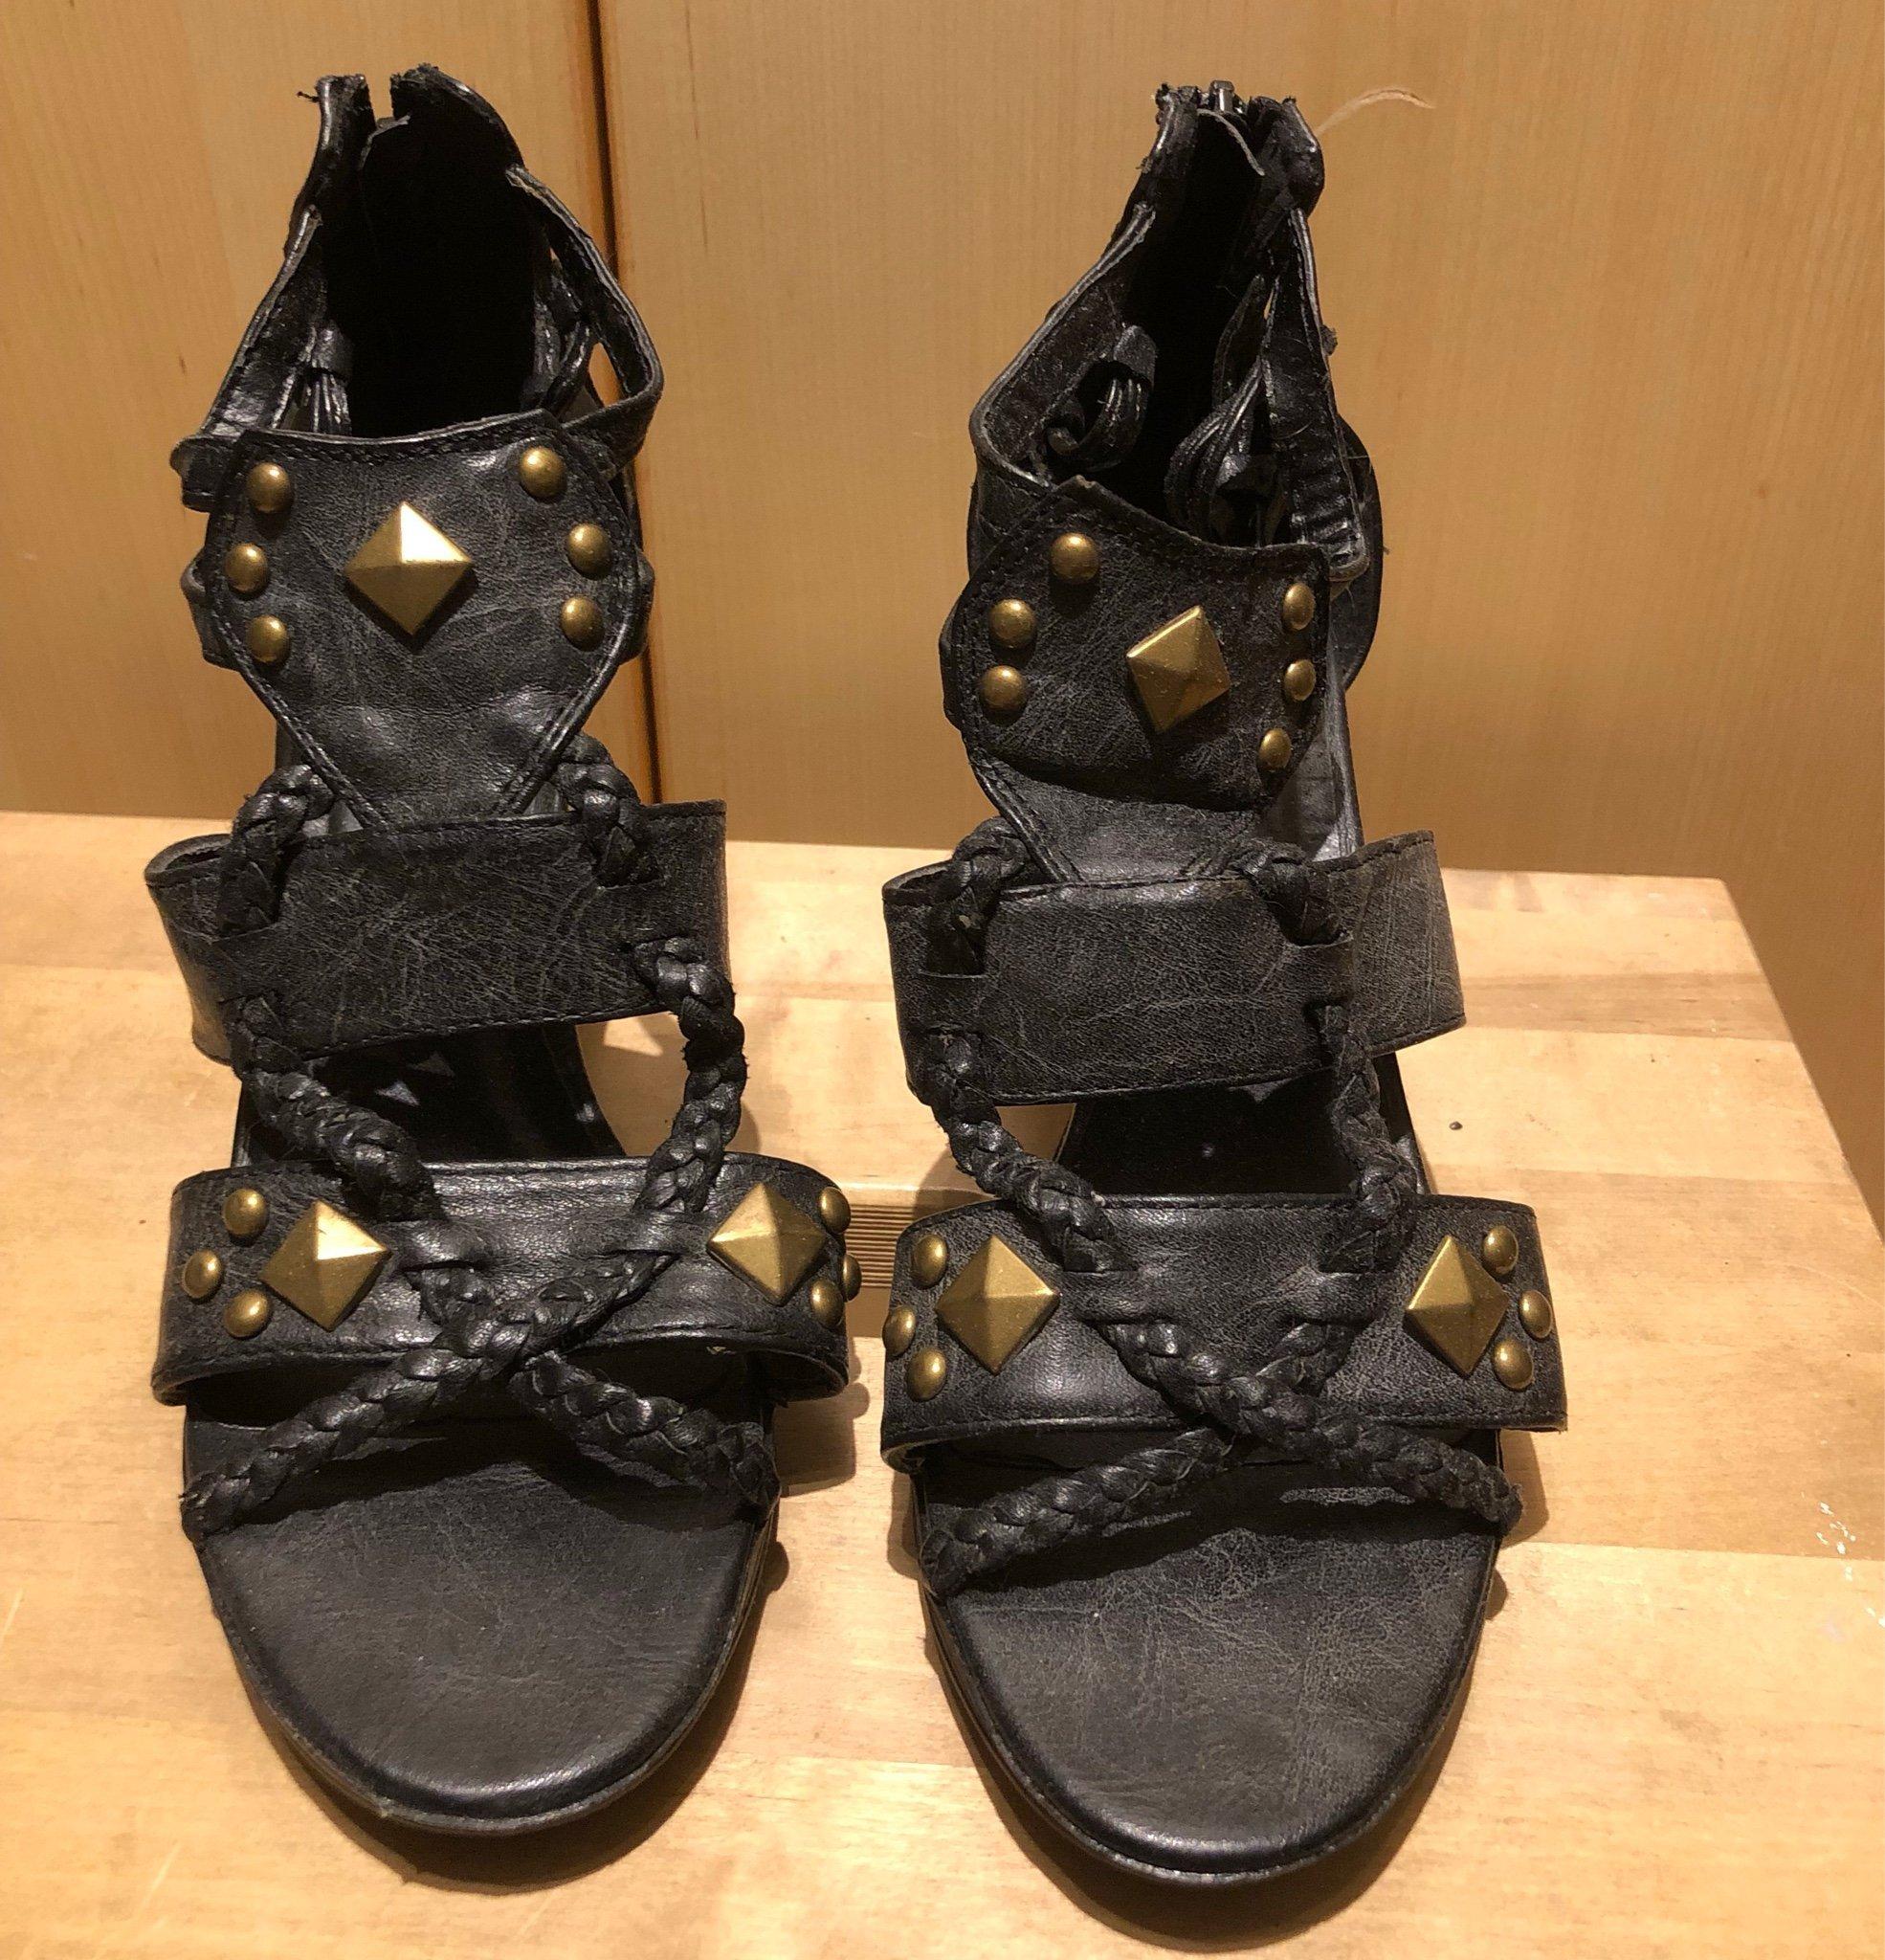 06d75c33516 Rebel sandal sandalett 37 gladiator skor (353476741) ᐈ Köp på Tradera